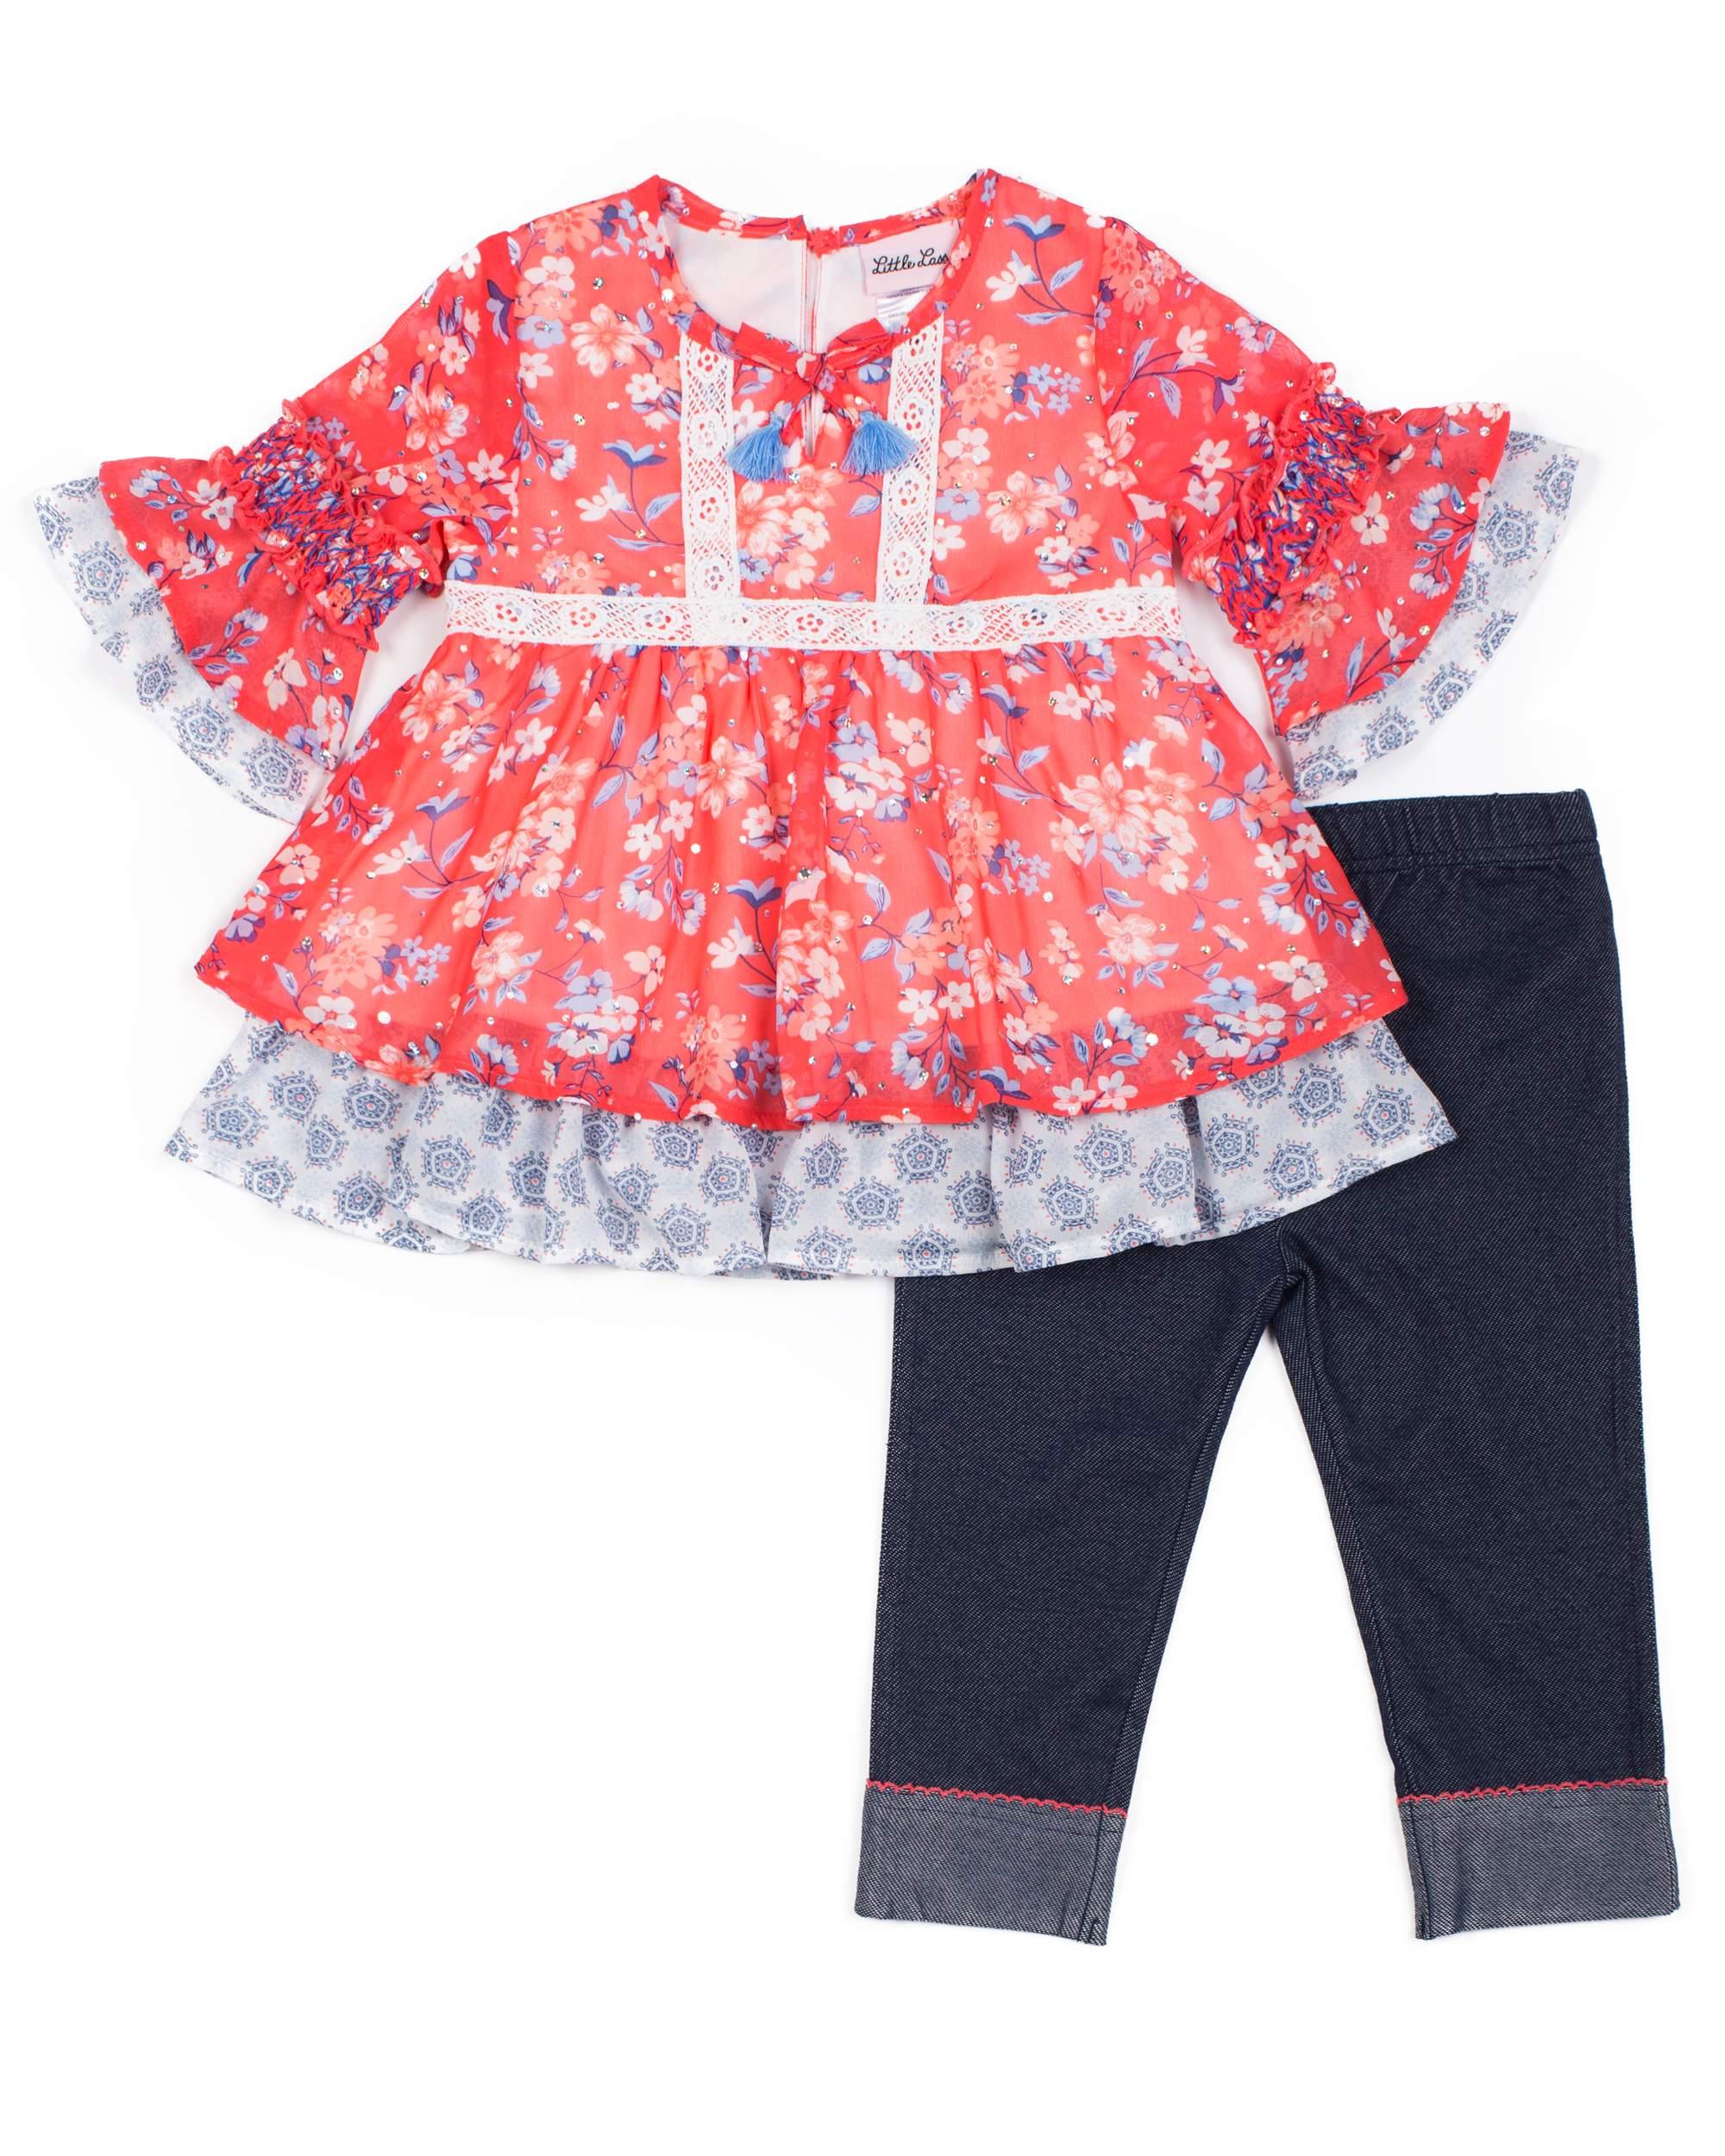 Floral Chiffon Disco Dot and Knit Denim Capri Legging, 2-Piece Outfit Set (Little Girls)